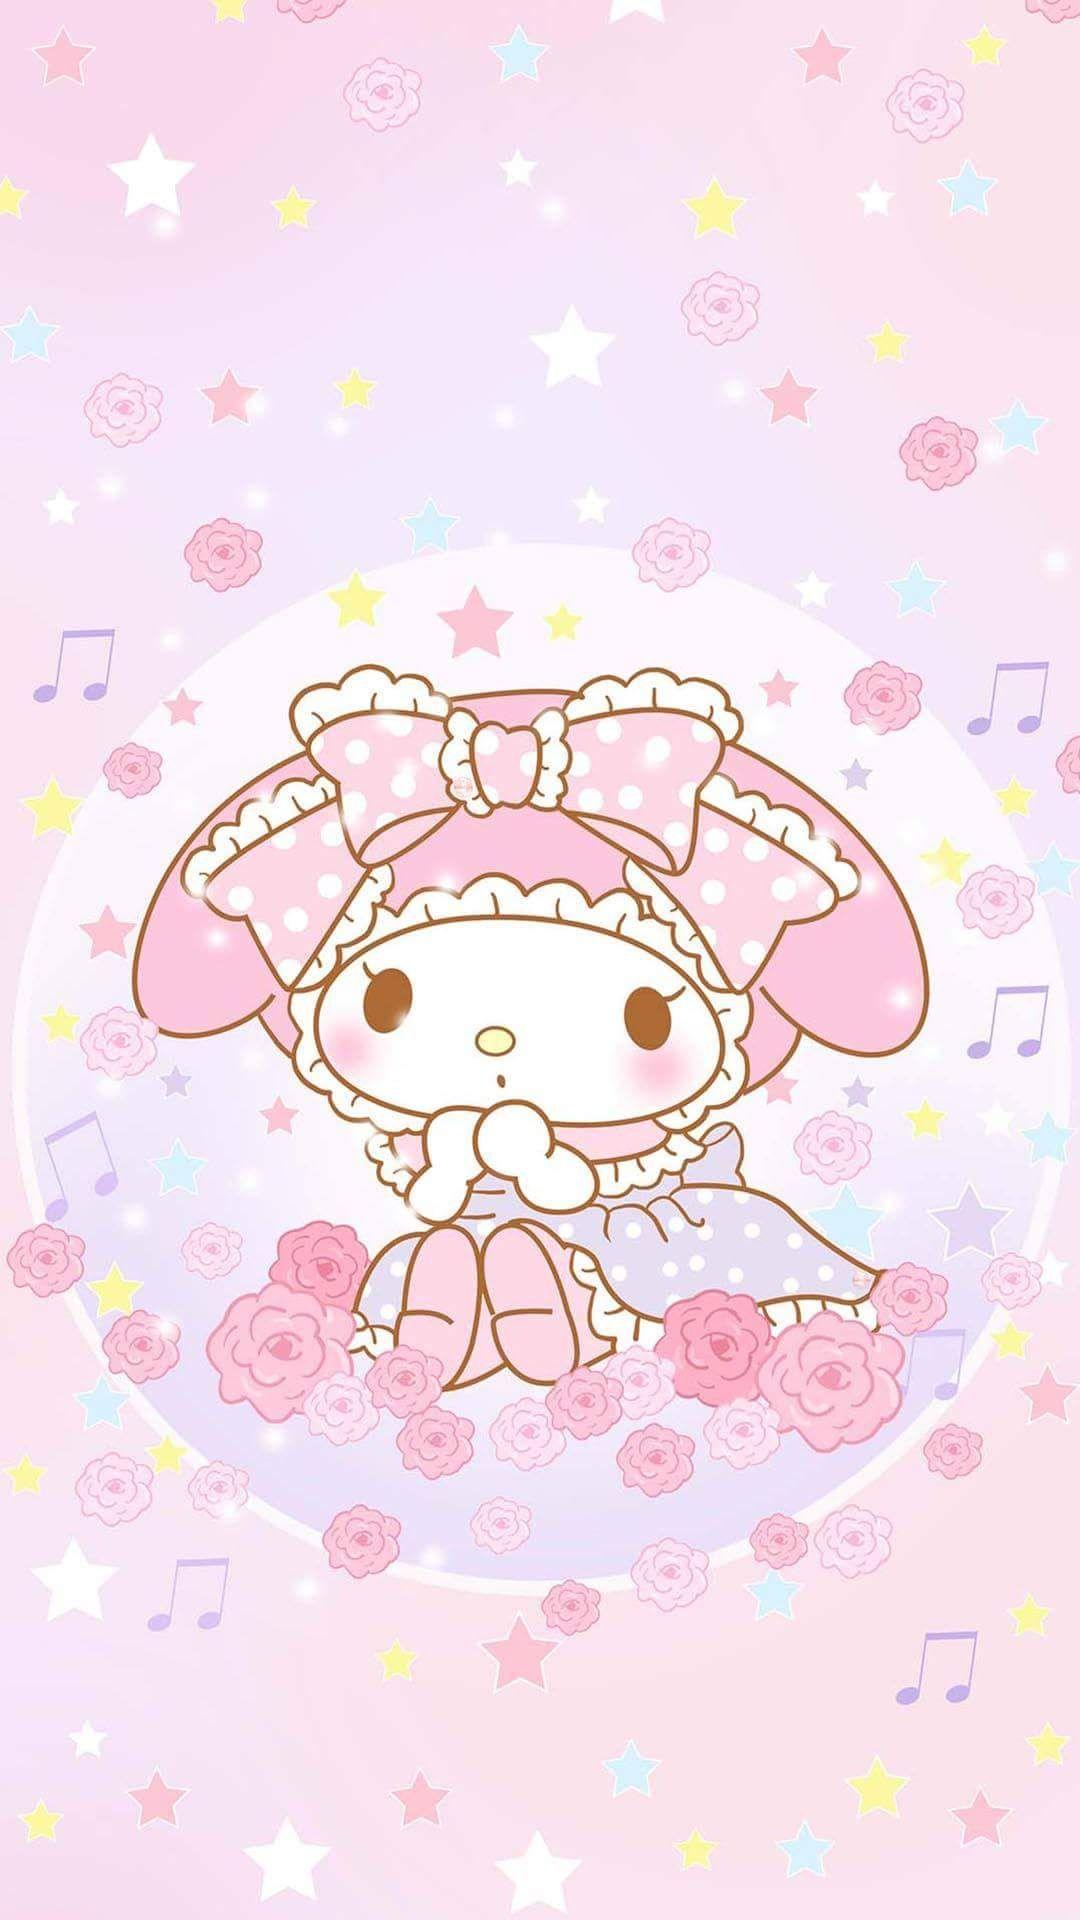 Simple Wallpaper Hello Kitty Kawaii - 692ce73e47a76215d341b6fa3cd71cda  HD_111089.jpg